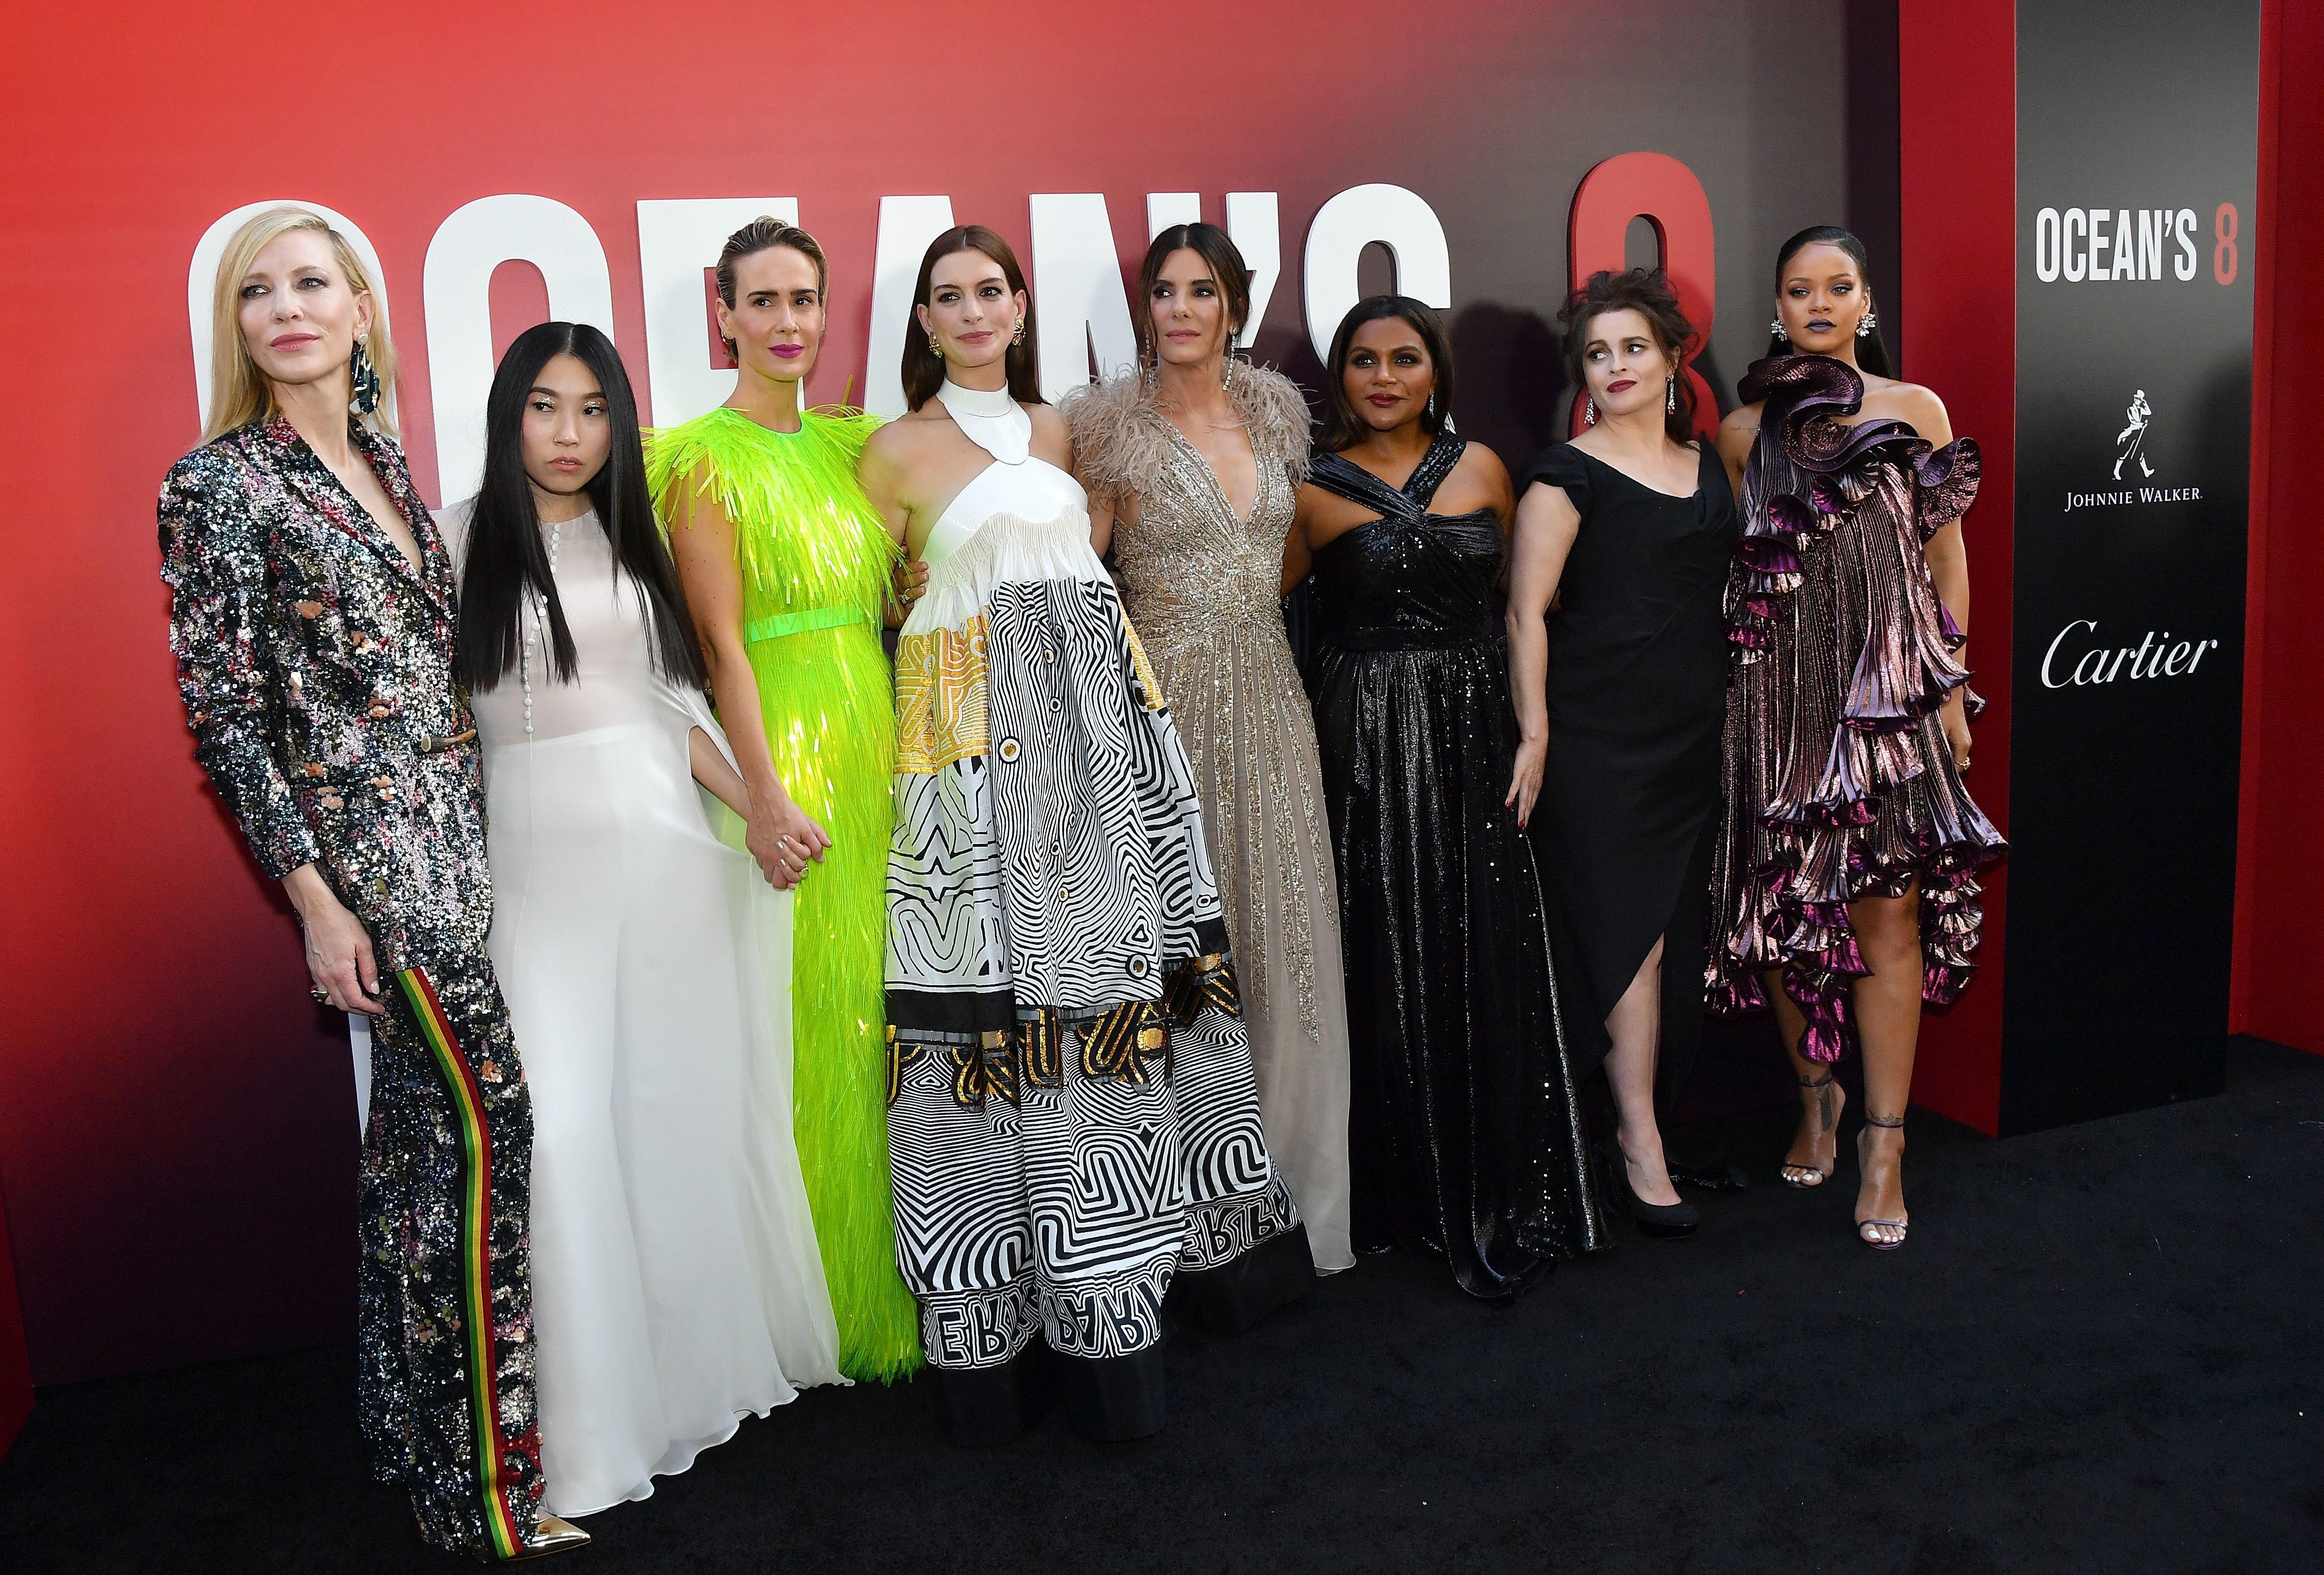 From left, Cate Blanchett, Awkwafina, Sarah Paulson, Anne Hathaway, Sandra Bullock, Mindy Kaling, Helena Bonham Carter and Ri